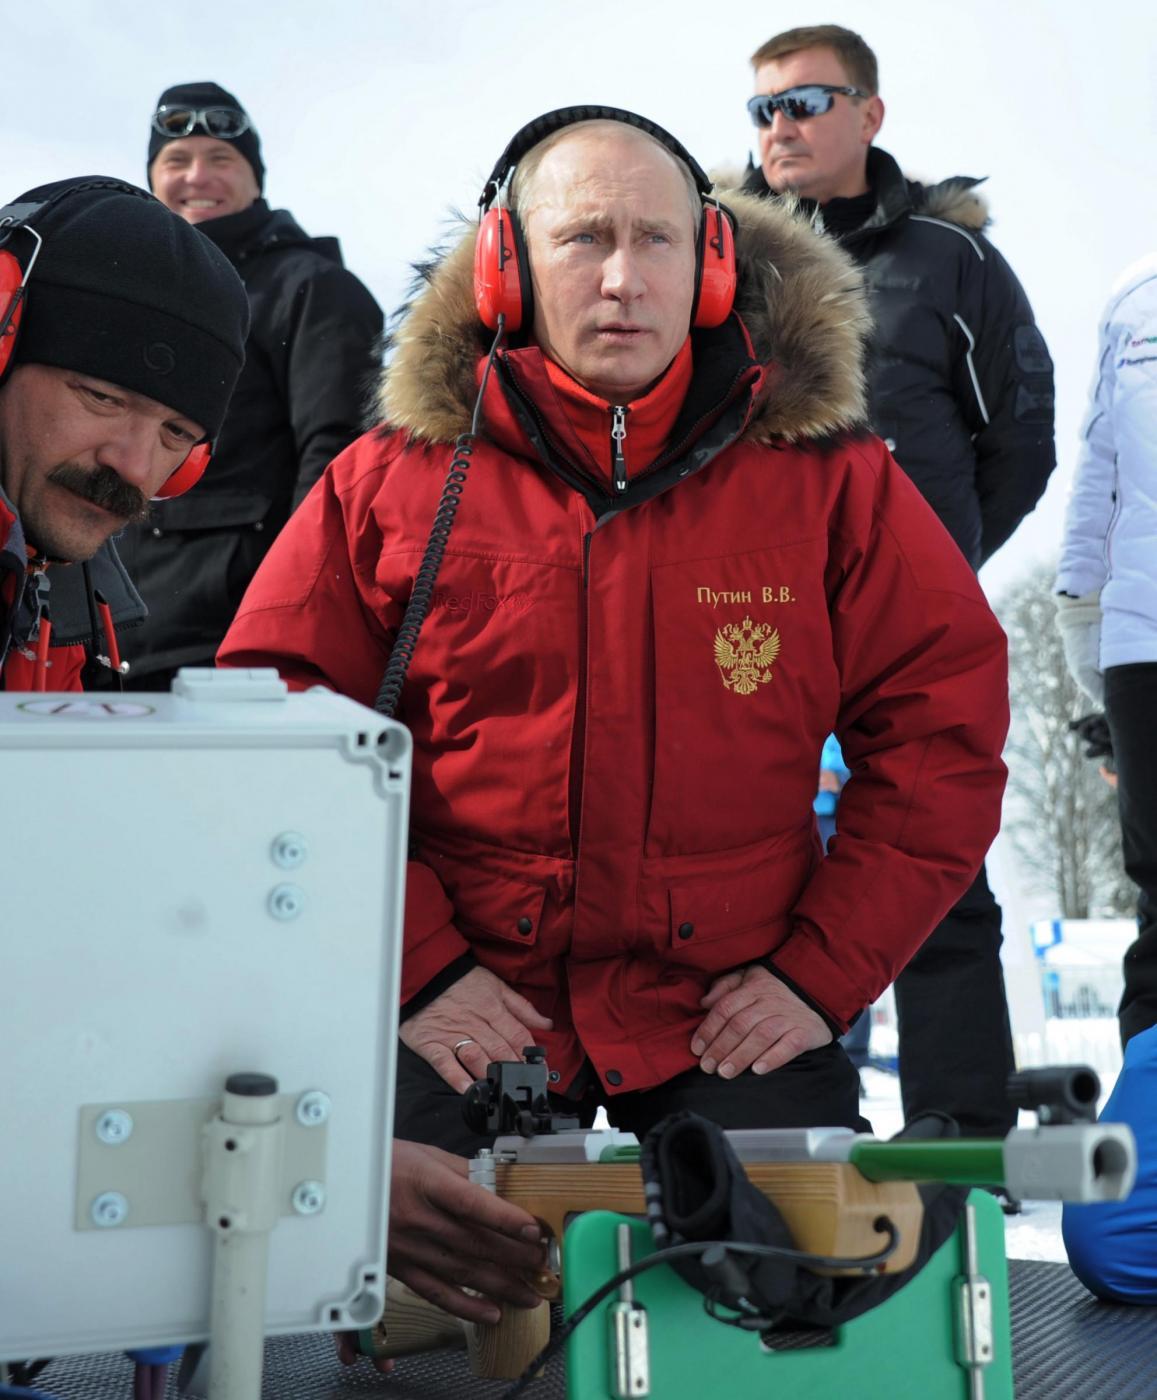 Vladimir Putin e Silvio Berlusconi a Krasnaja Poliana04